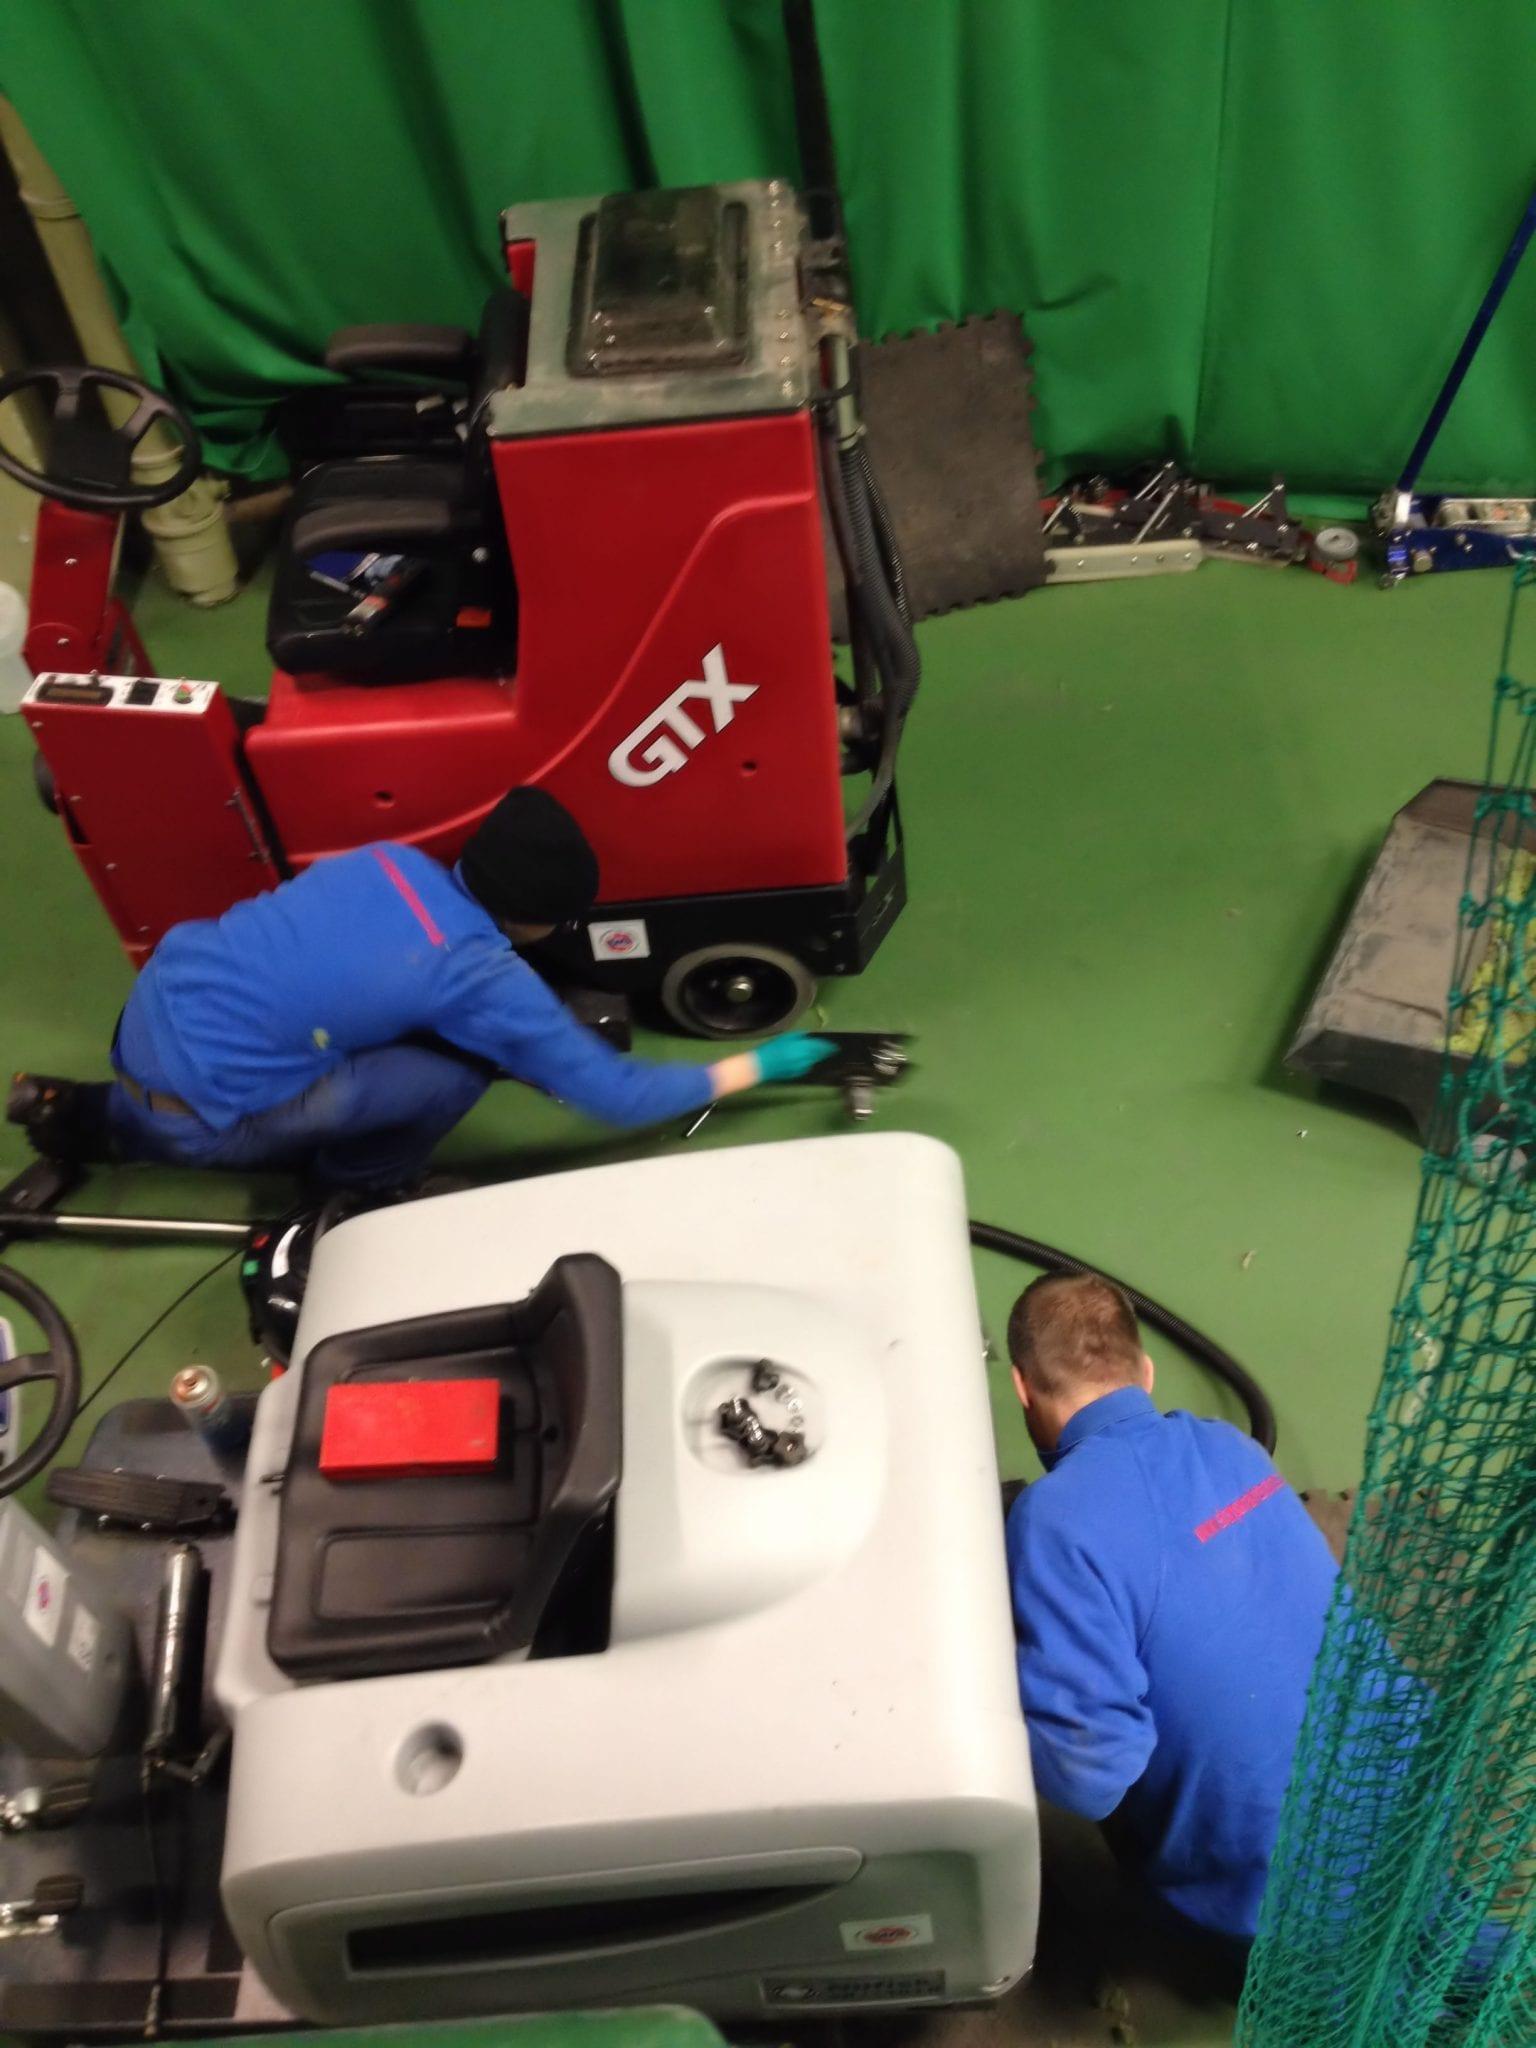 Floor cleaning machine service & repairs